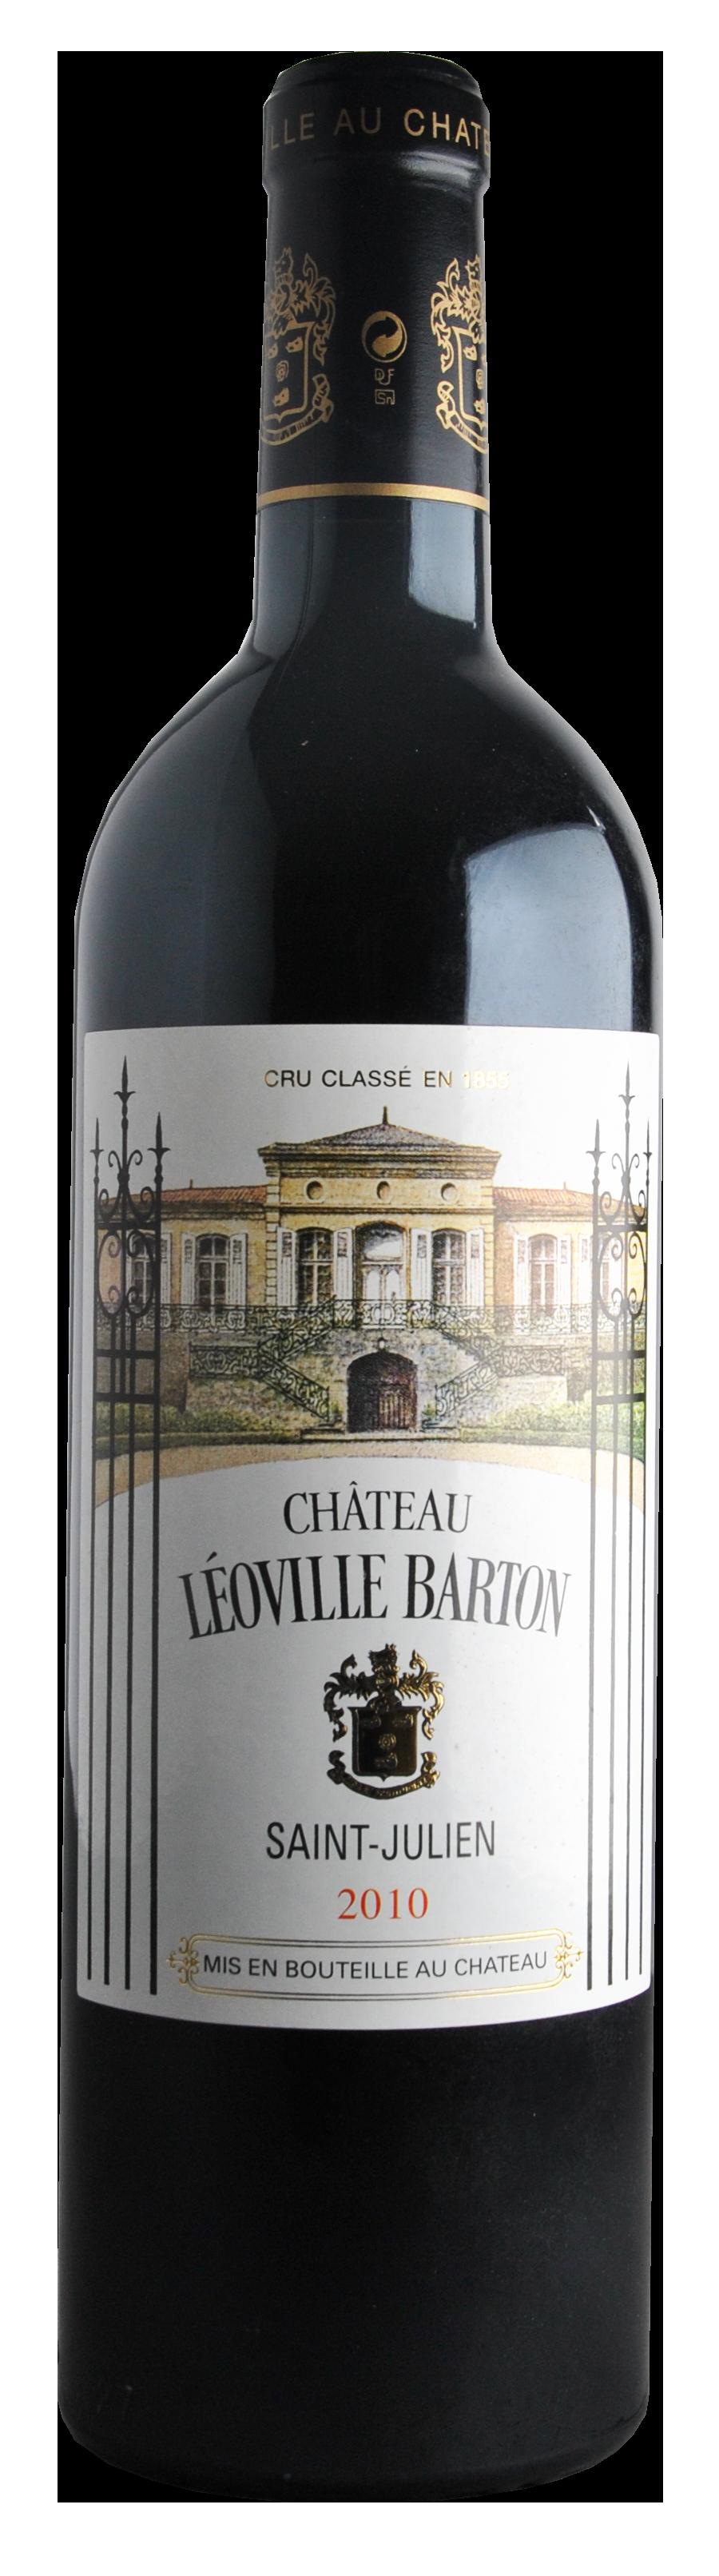 Léoville Barton - Vins Pirard